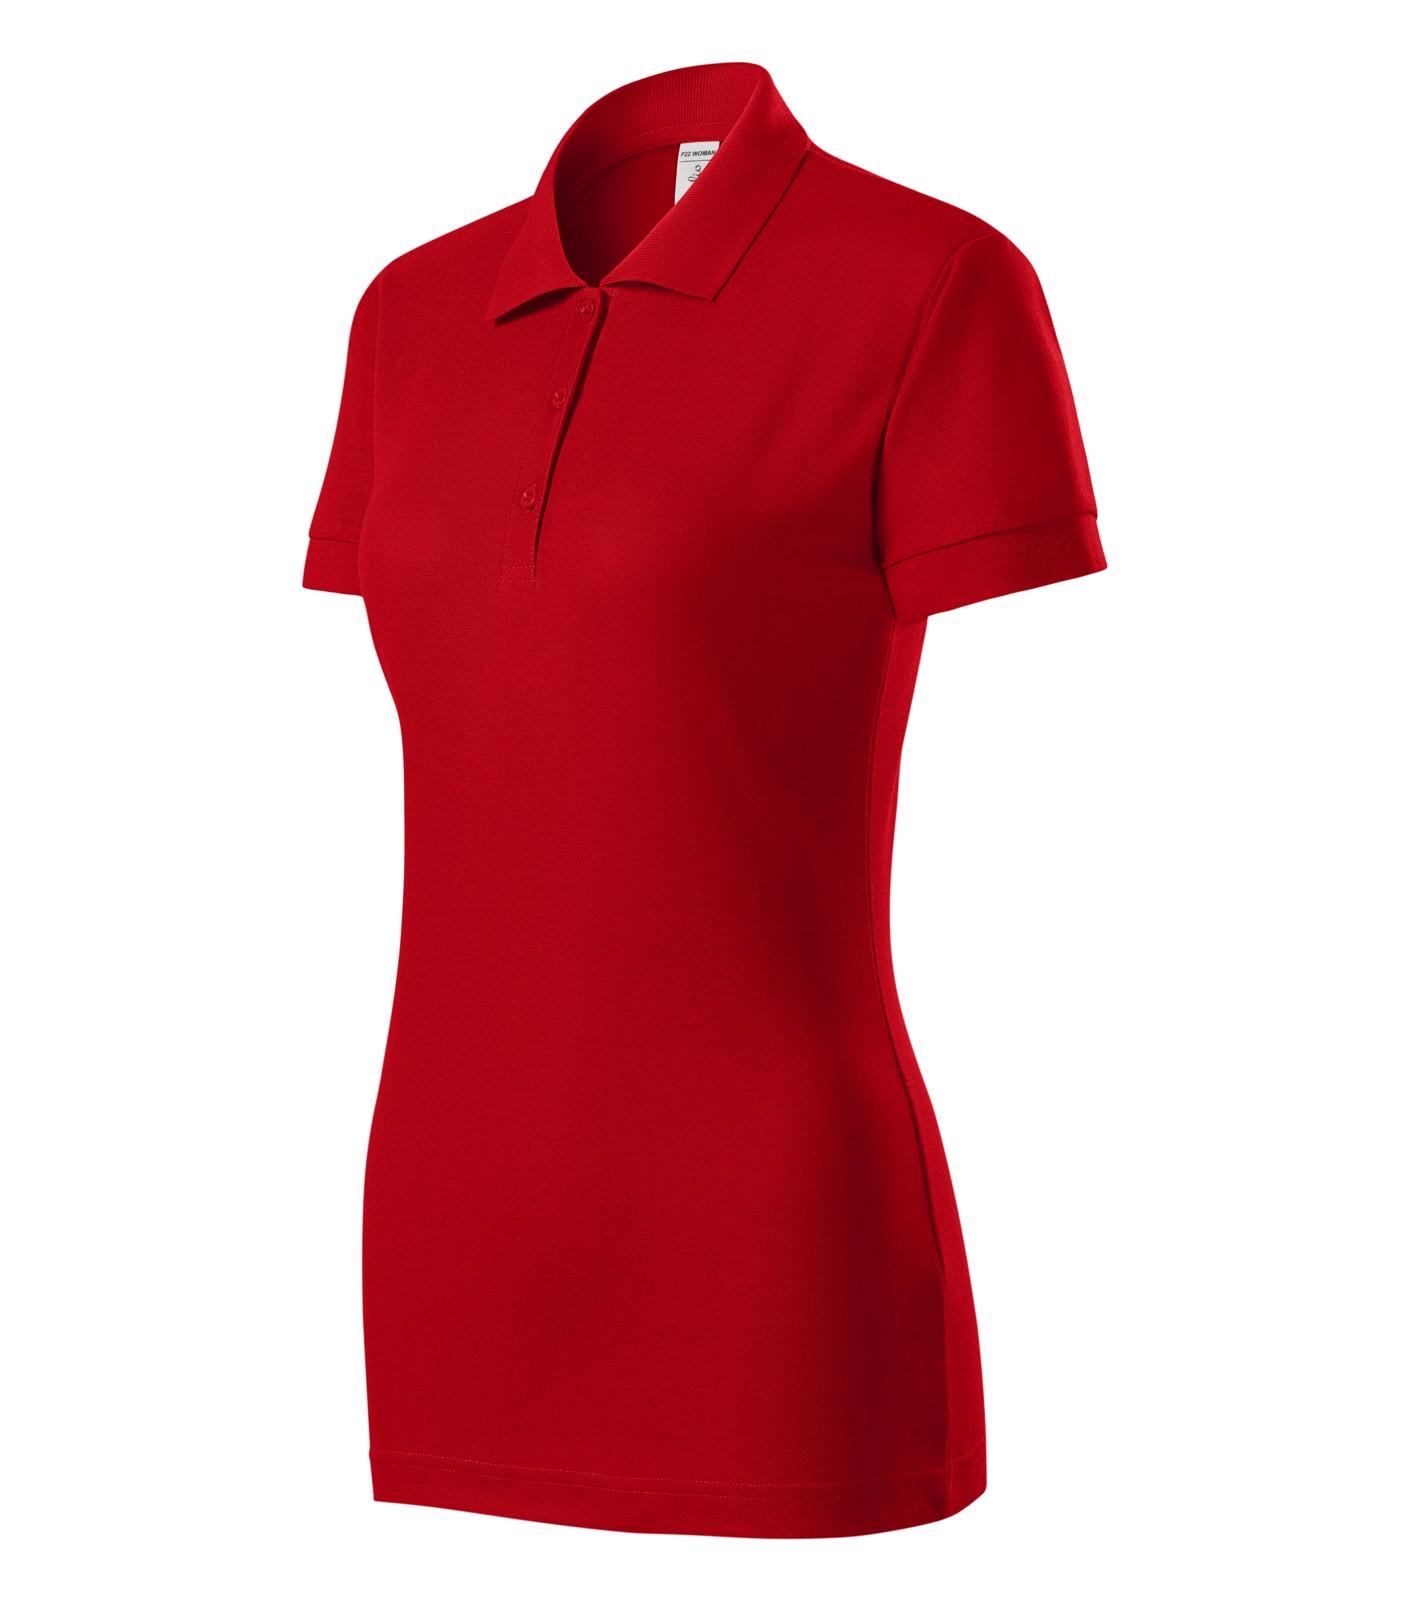 Polo Shirt women's Piccolio Joy - Red / 2XL